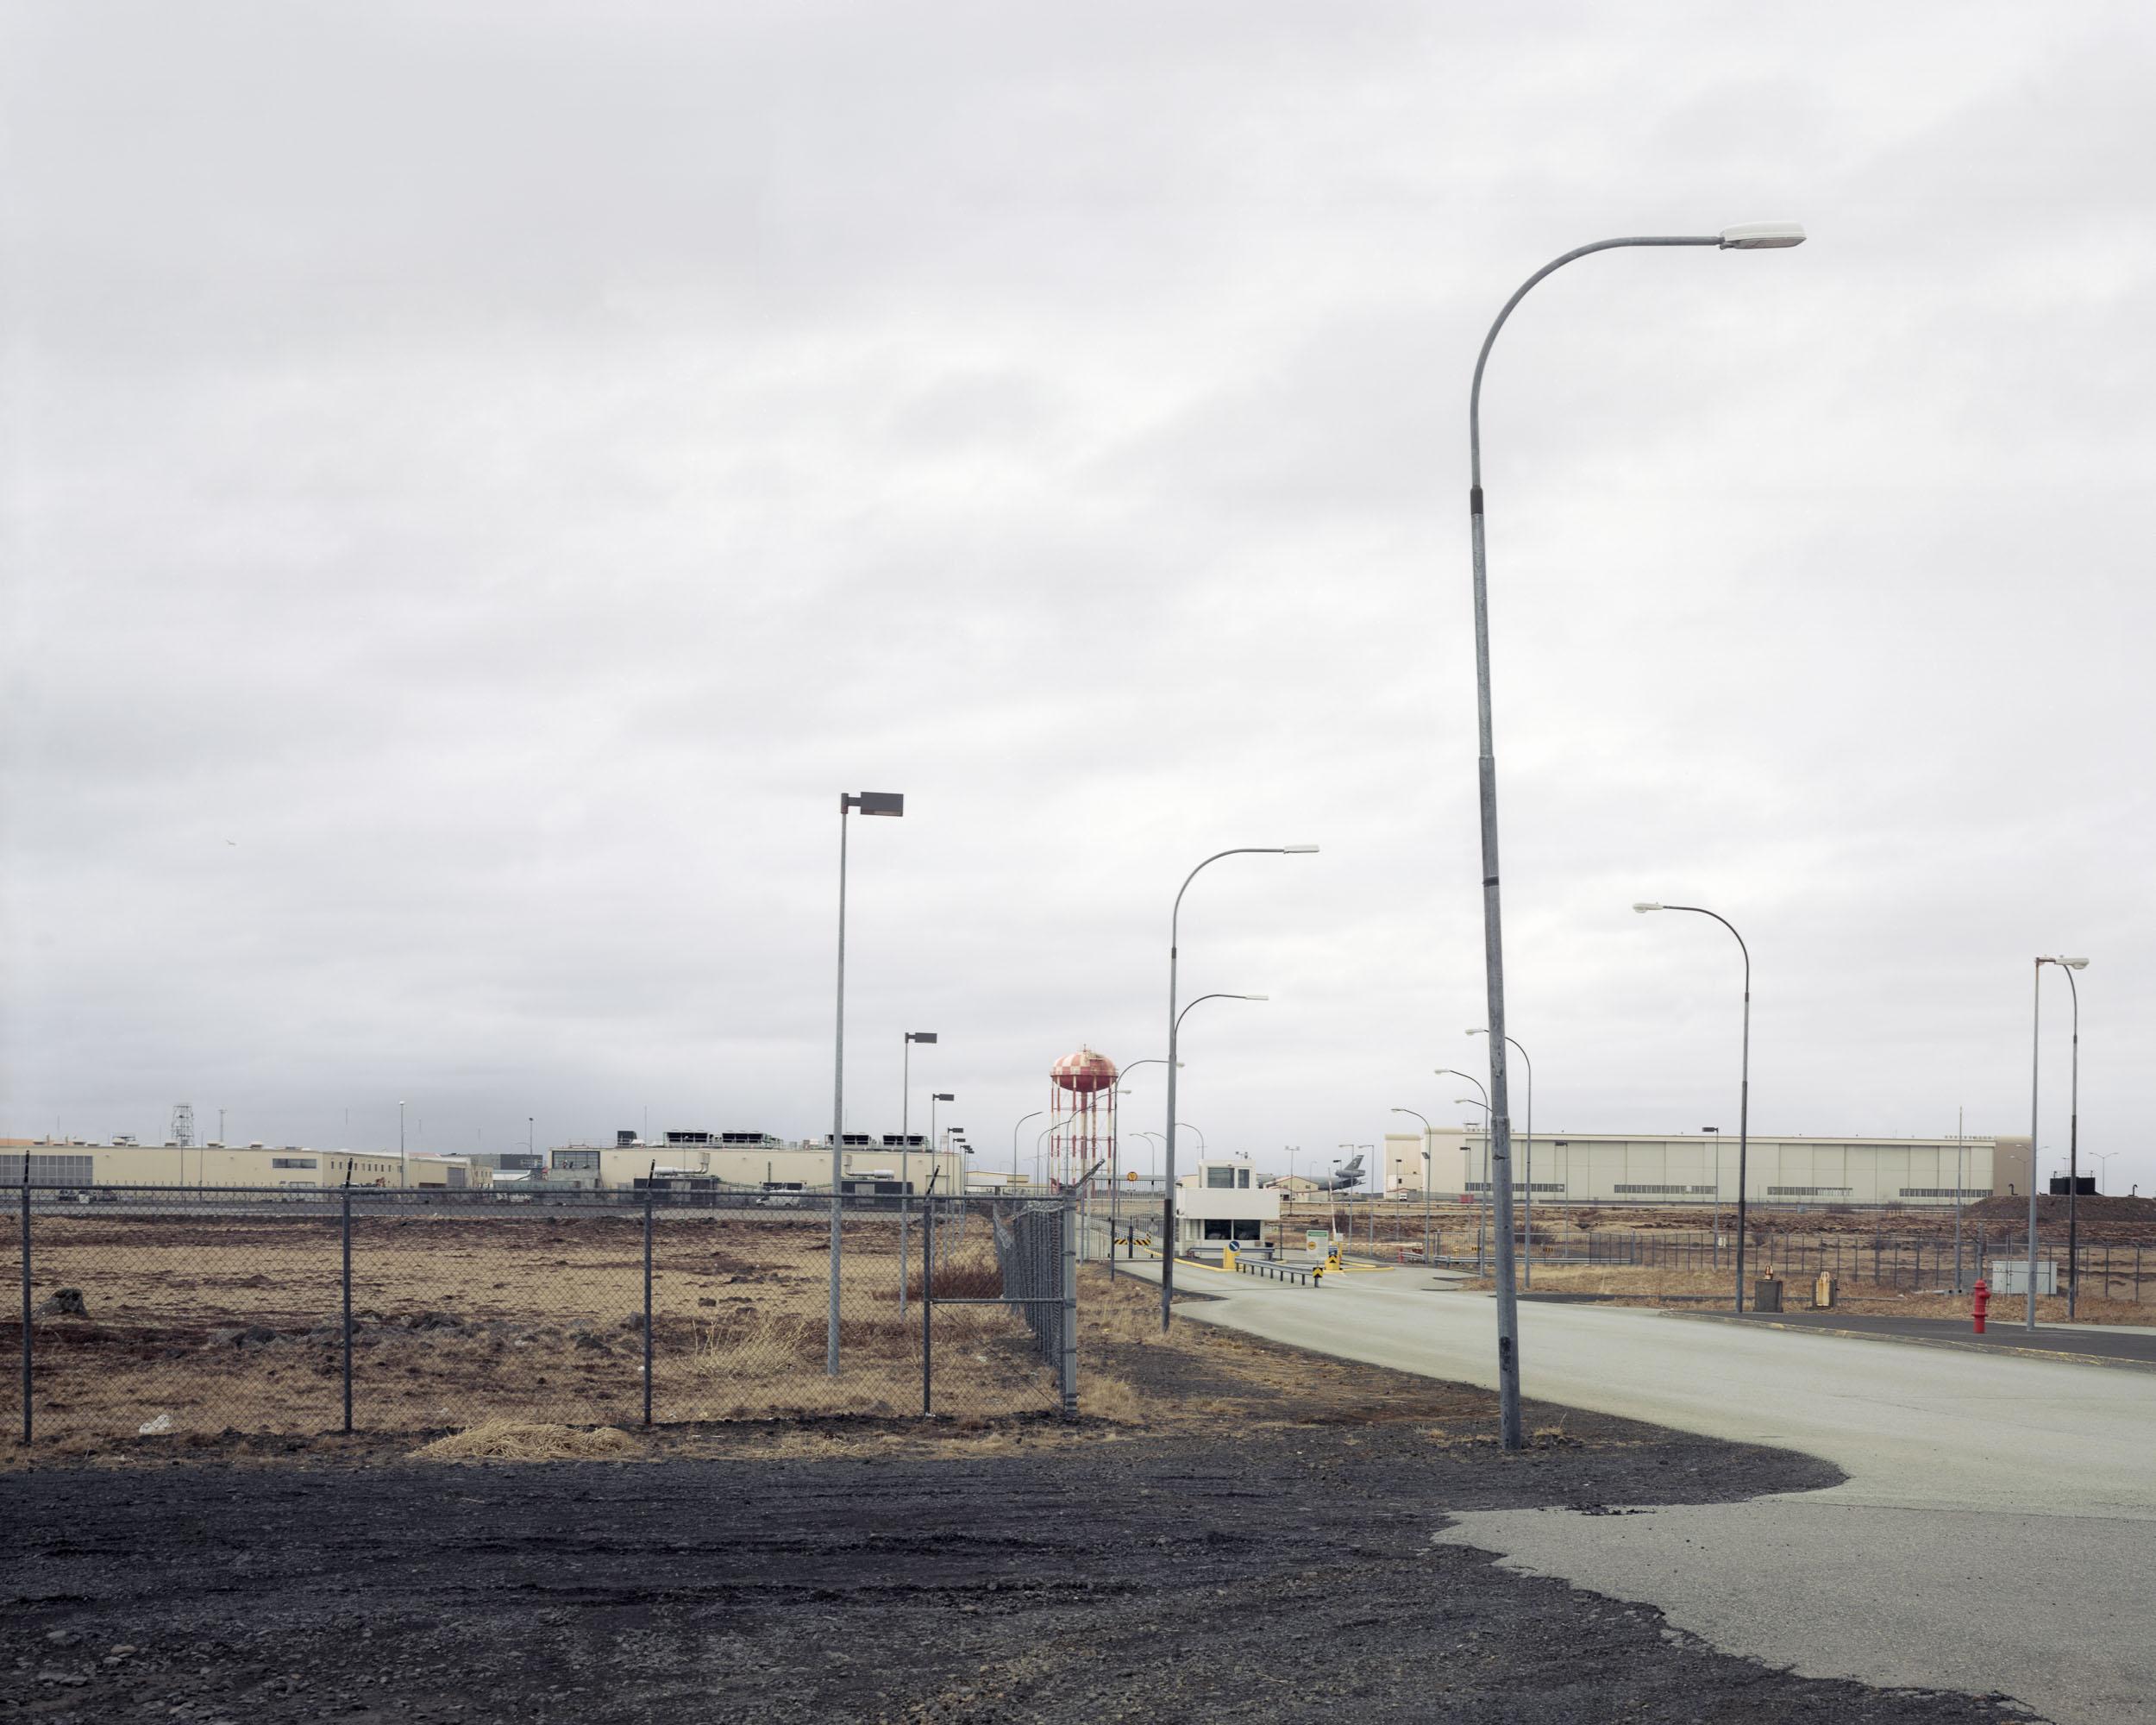 US Military Base, Keflavík